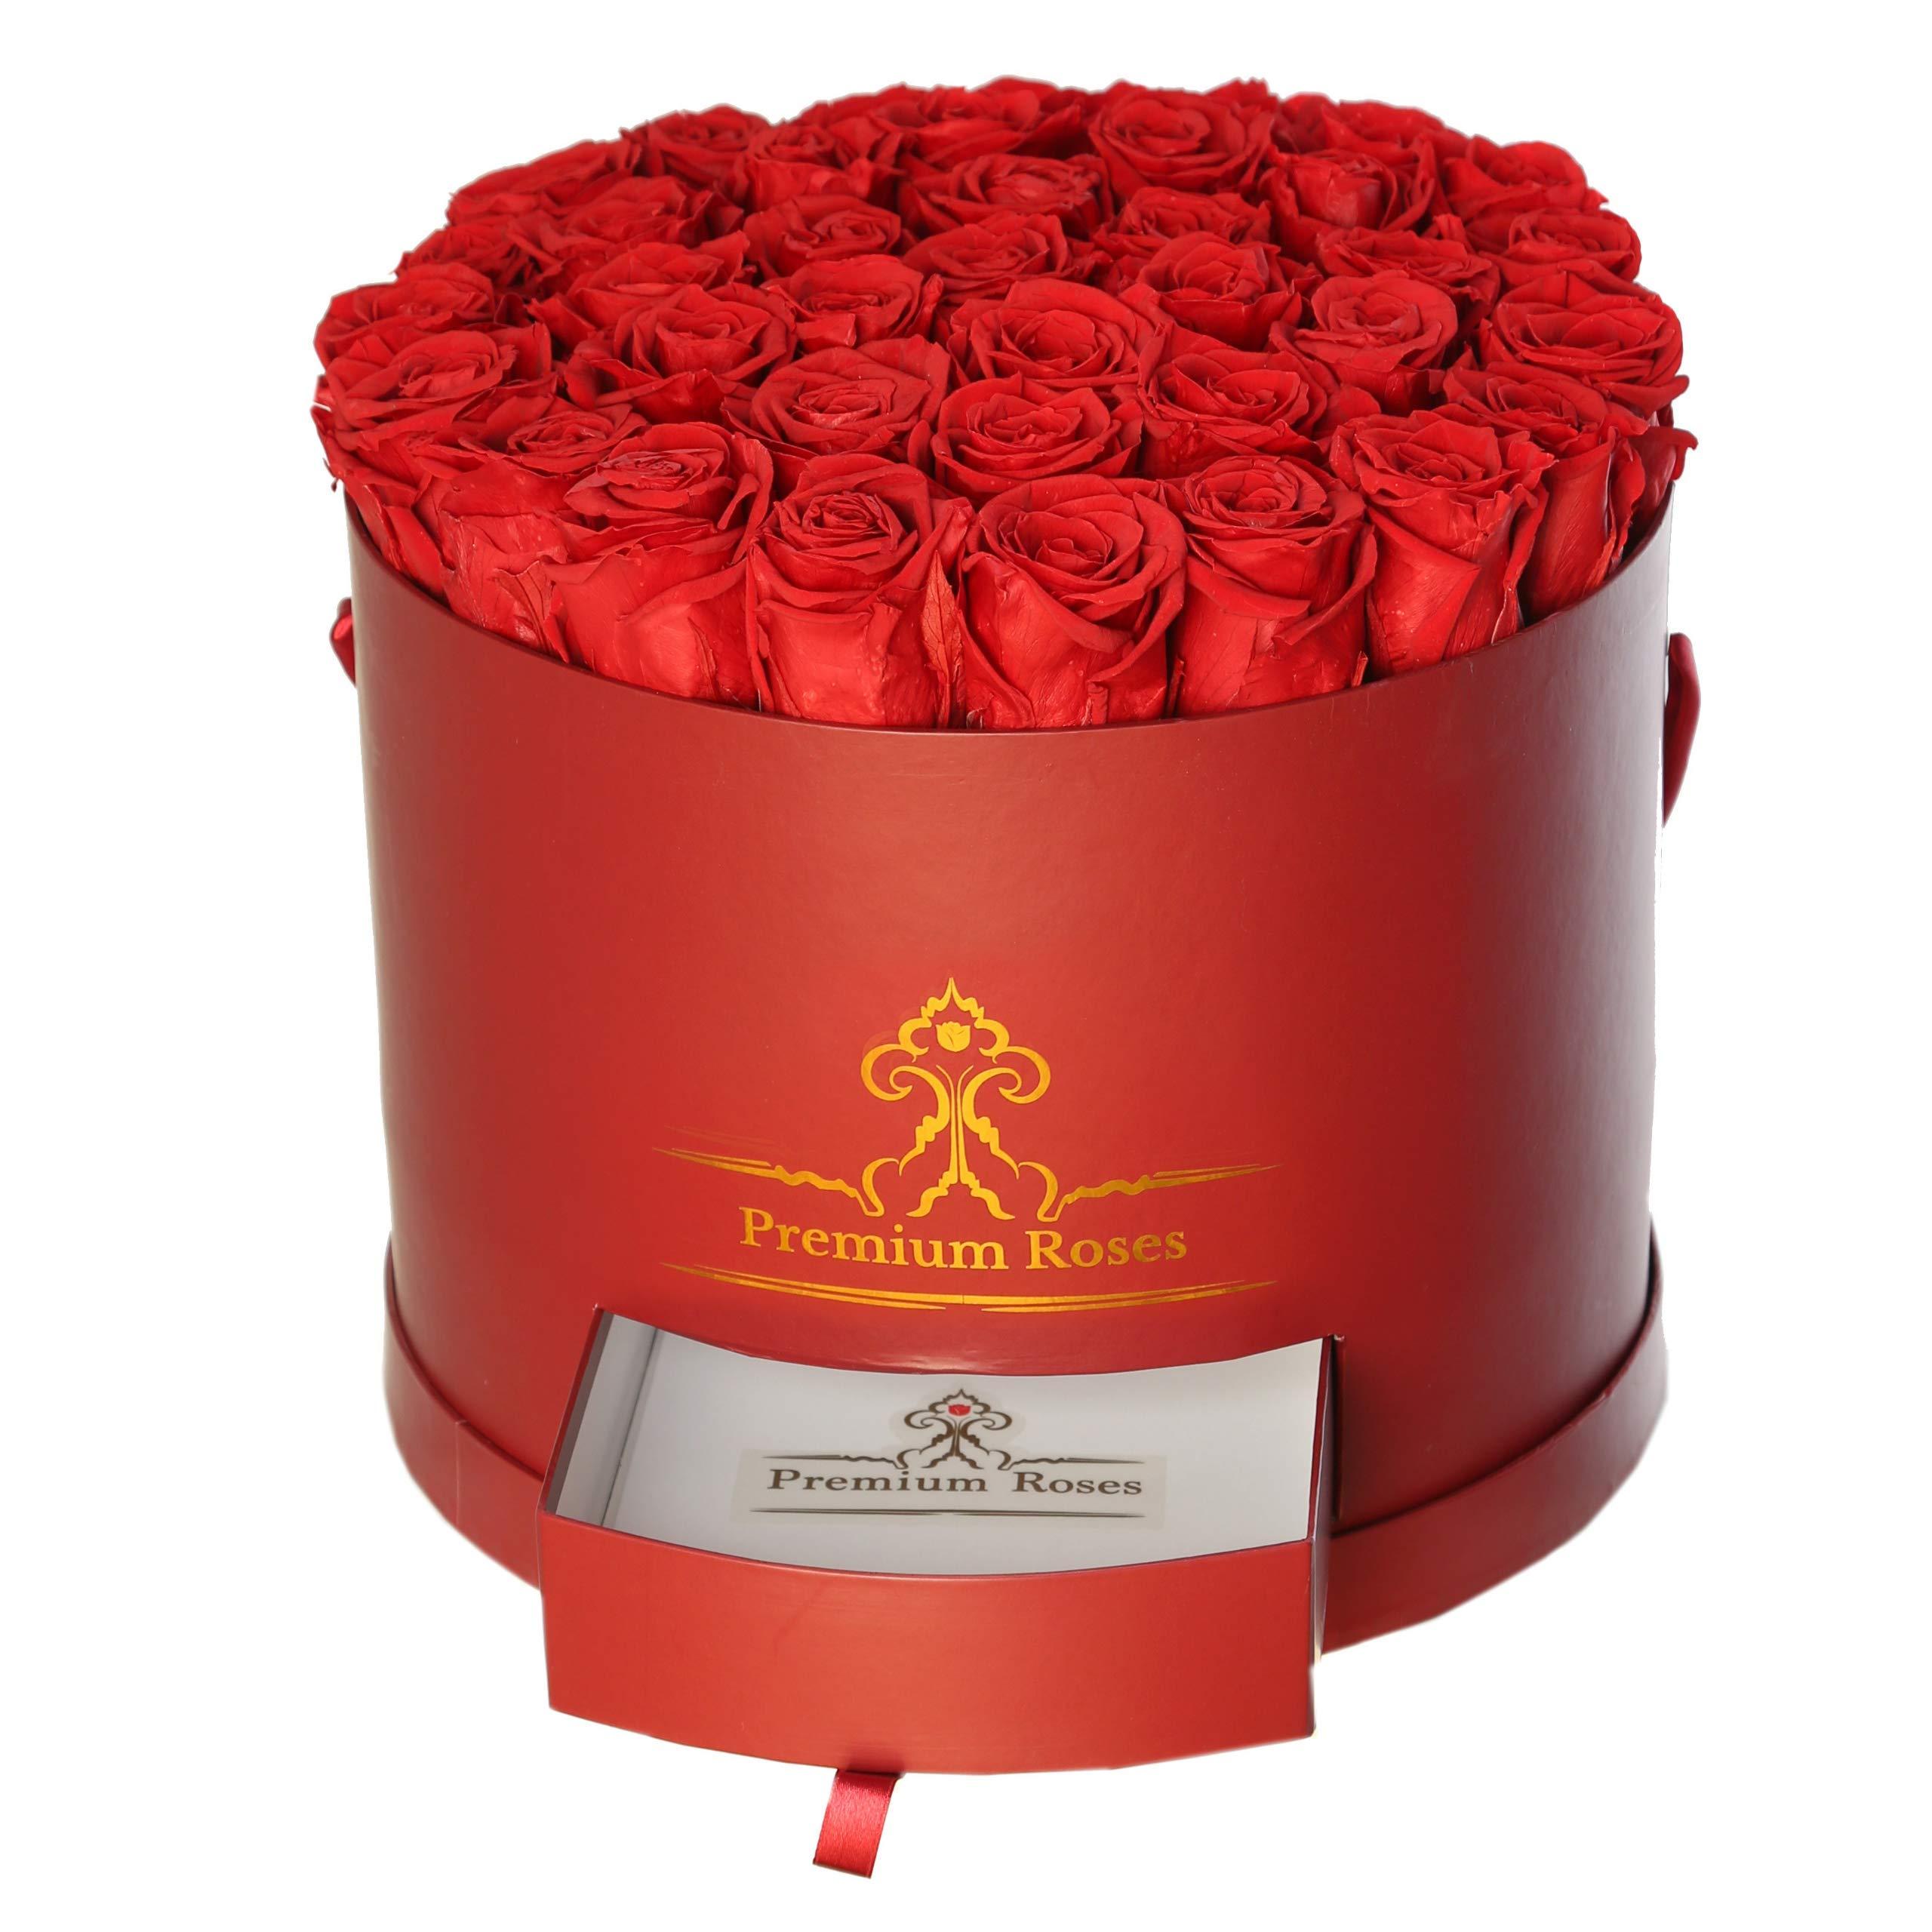 Premium Roses| Model Burgundy| Real Roses That Last 365 Days| Fresh Flowers (Burgundy Box, Large)